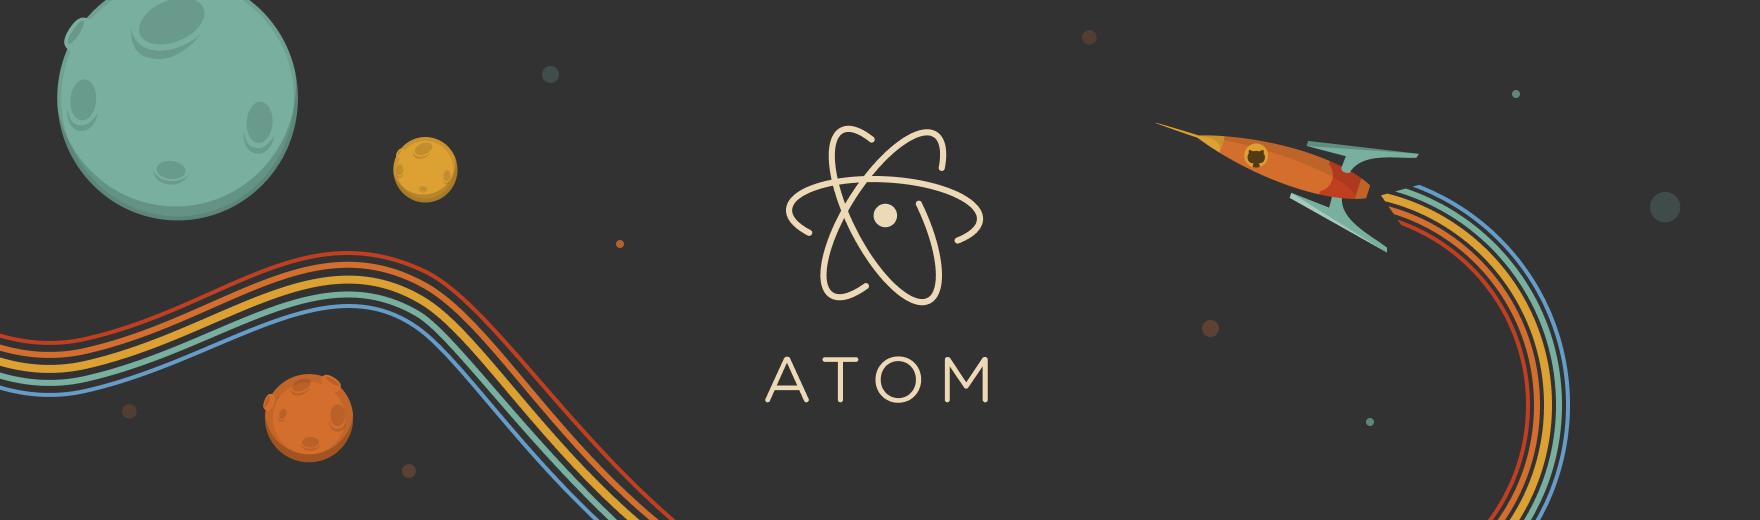 GitHub - atom/atom: The hackable text editor